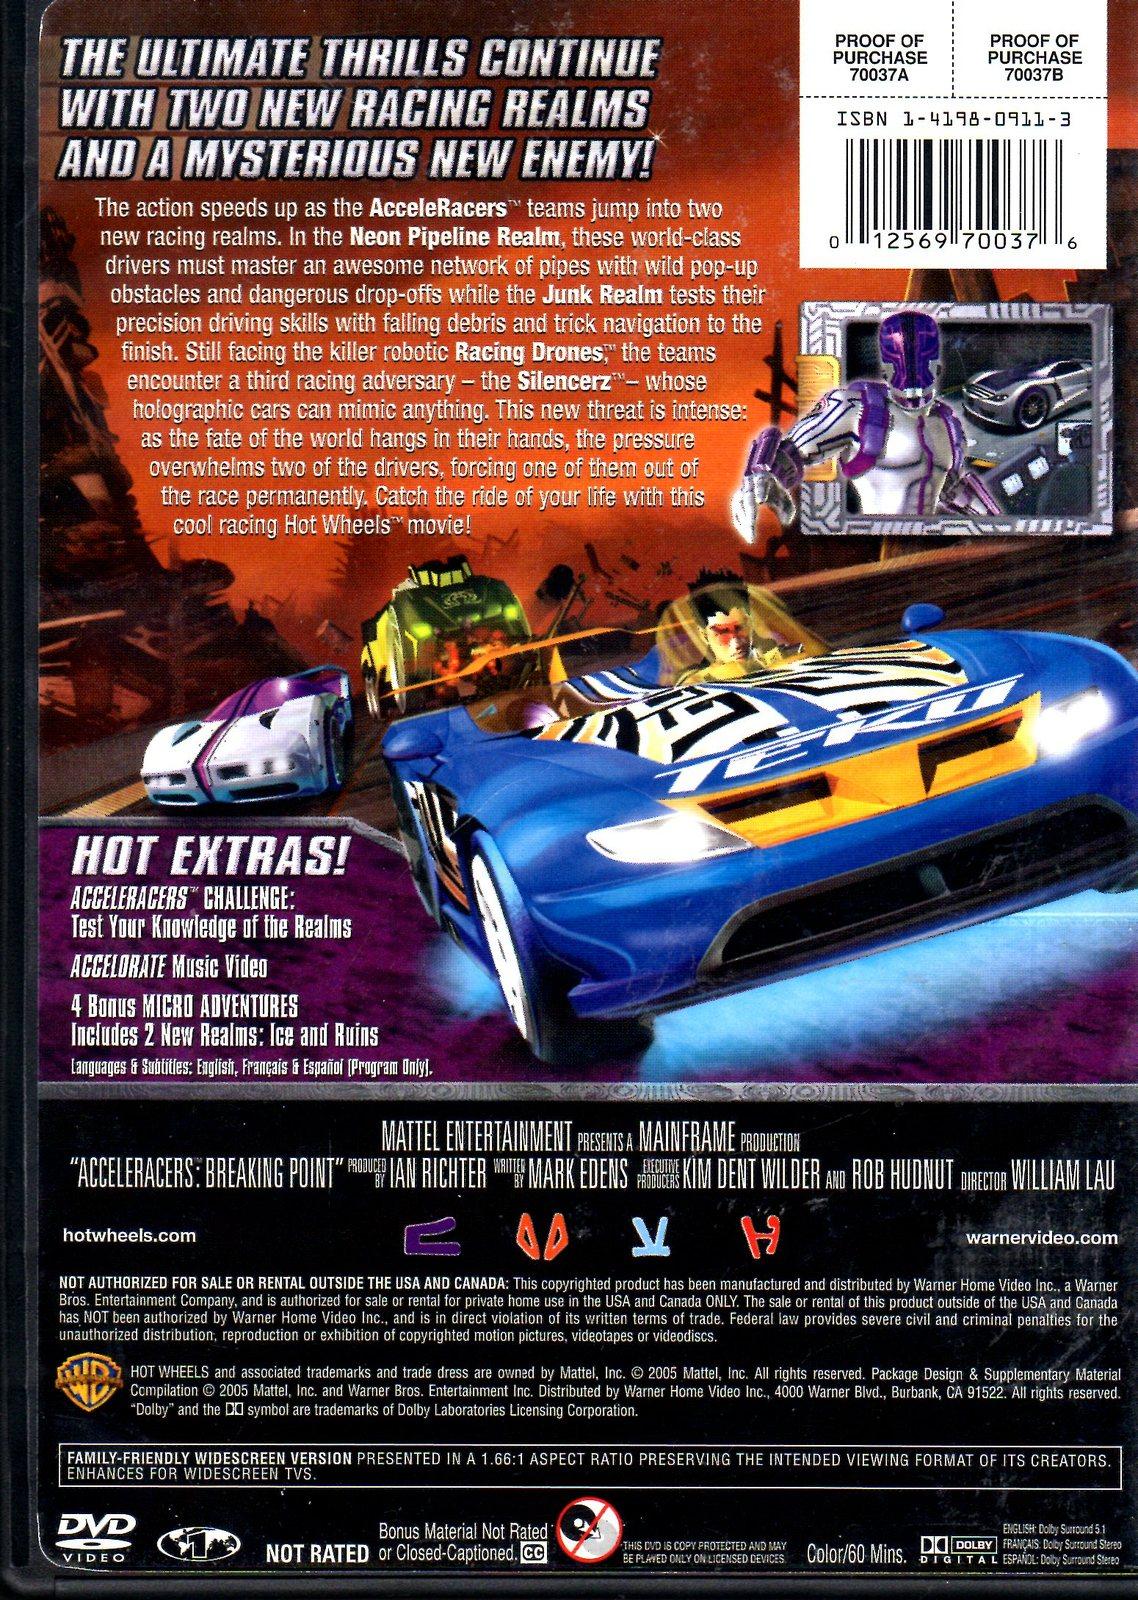 DVD - Hot Wheels AcceleRacers Breaking Point DVD Movie 3